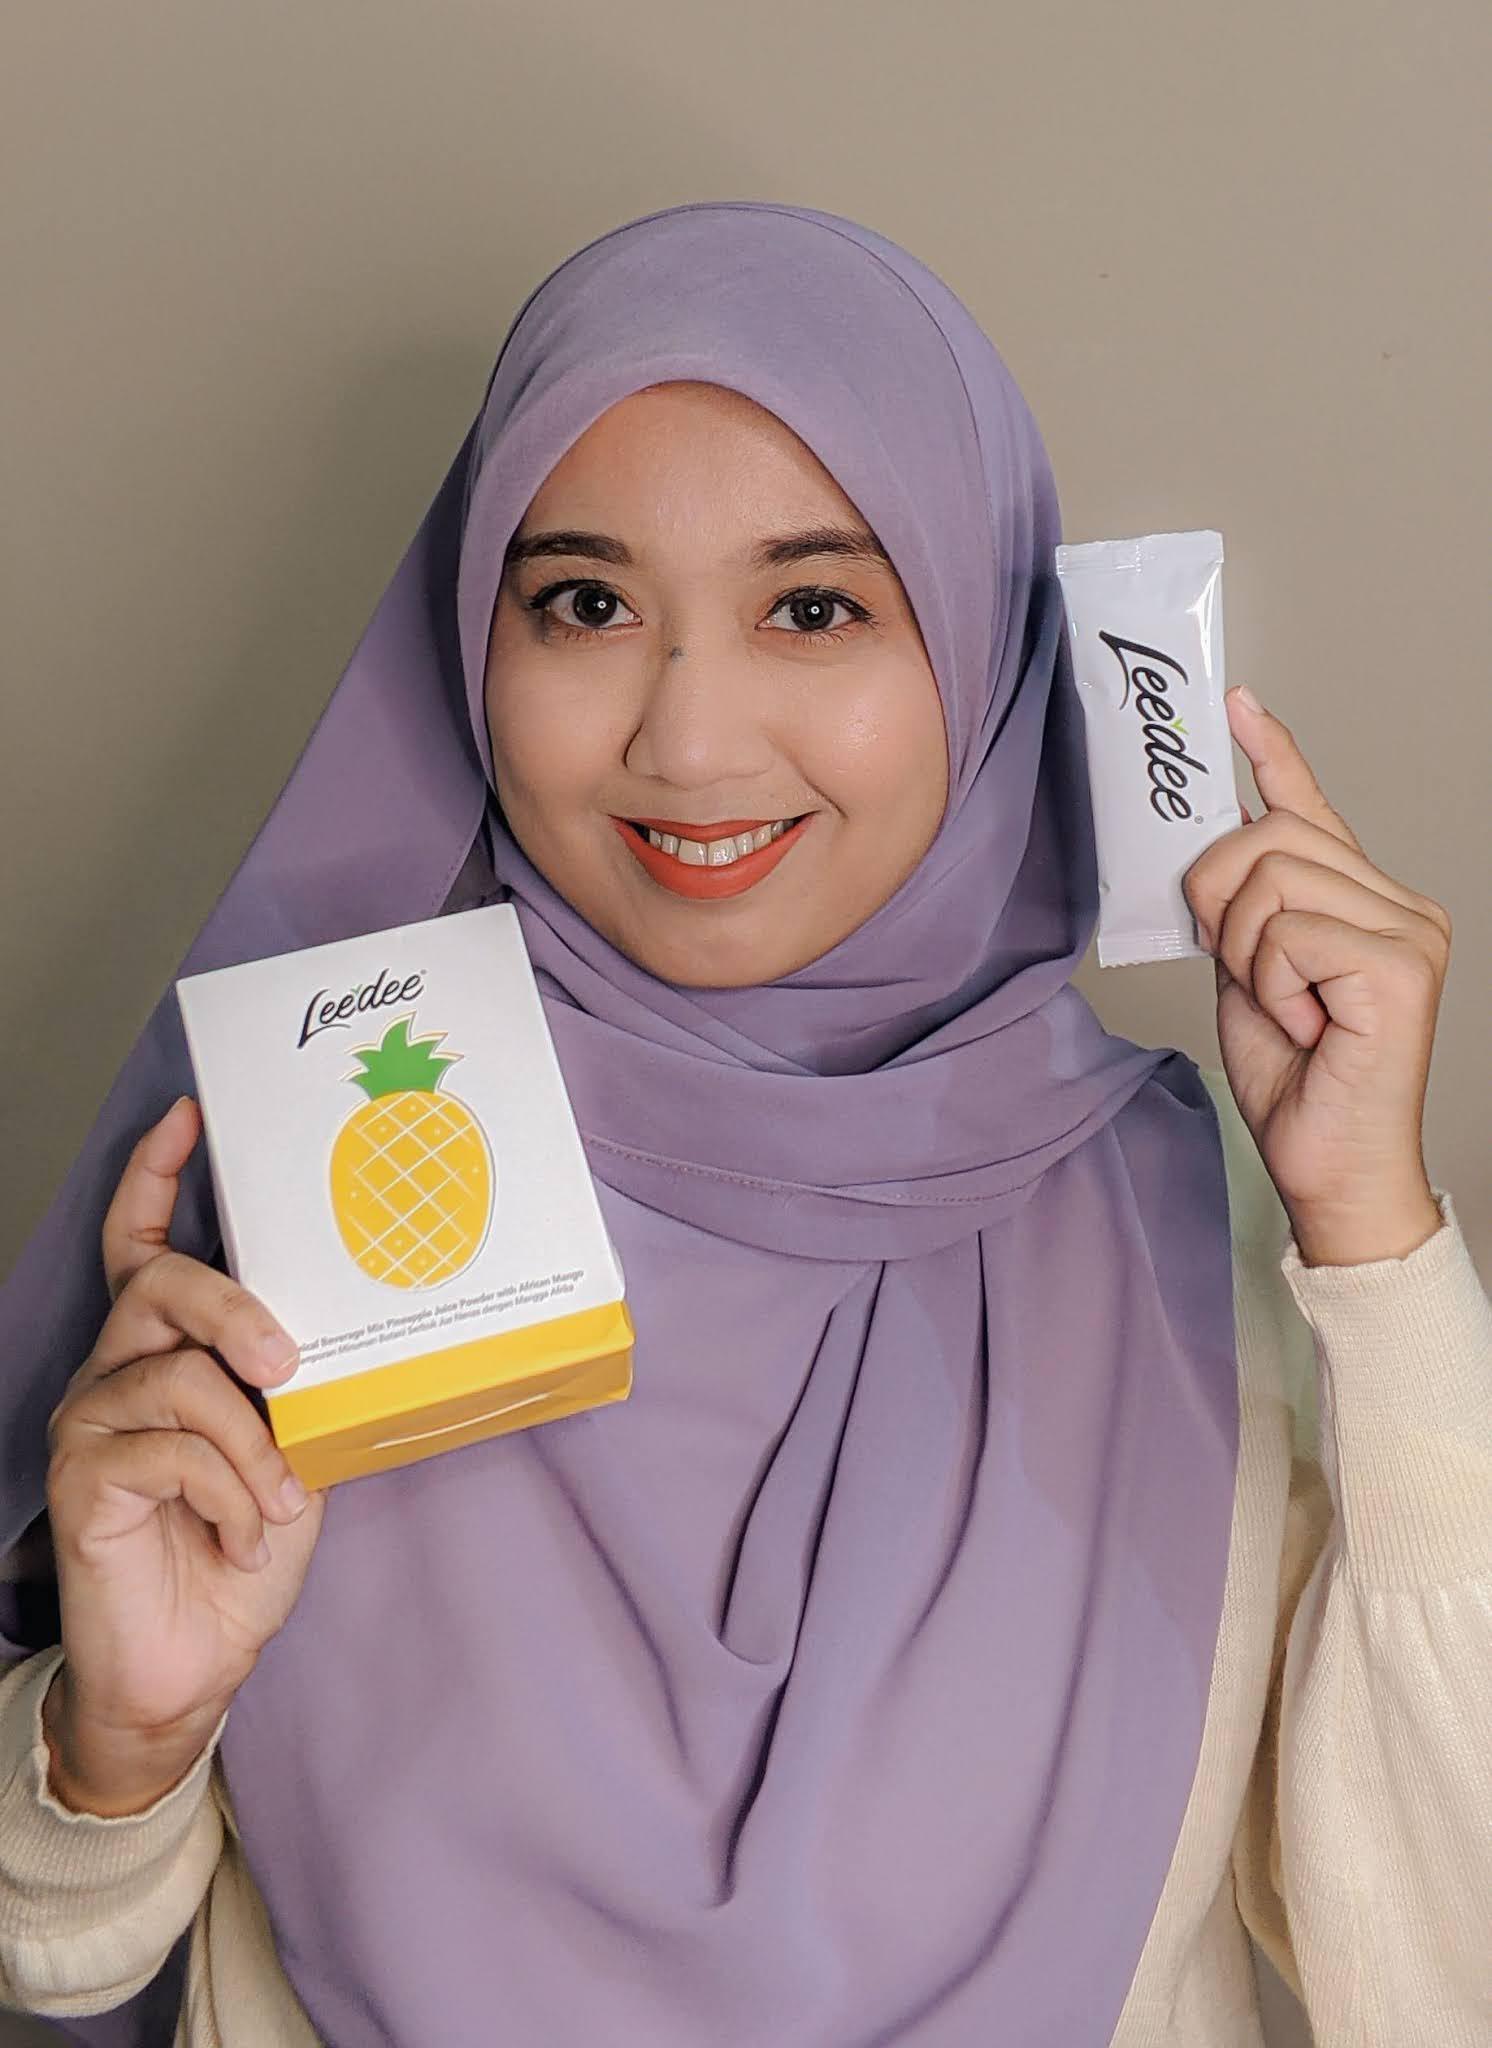 Leedee Pineapple dan Leedee Tox Peach Minuman Botani ada Kelulusan Ke?